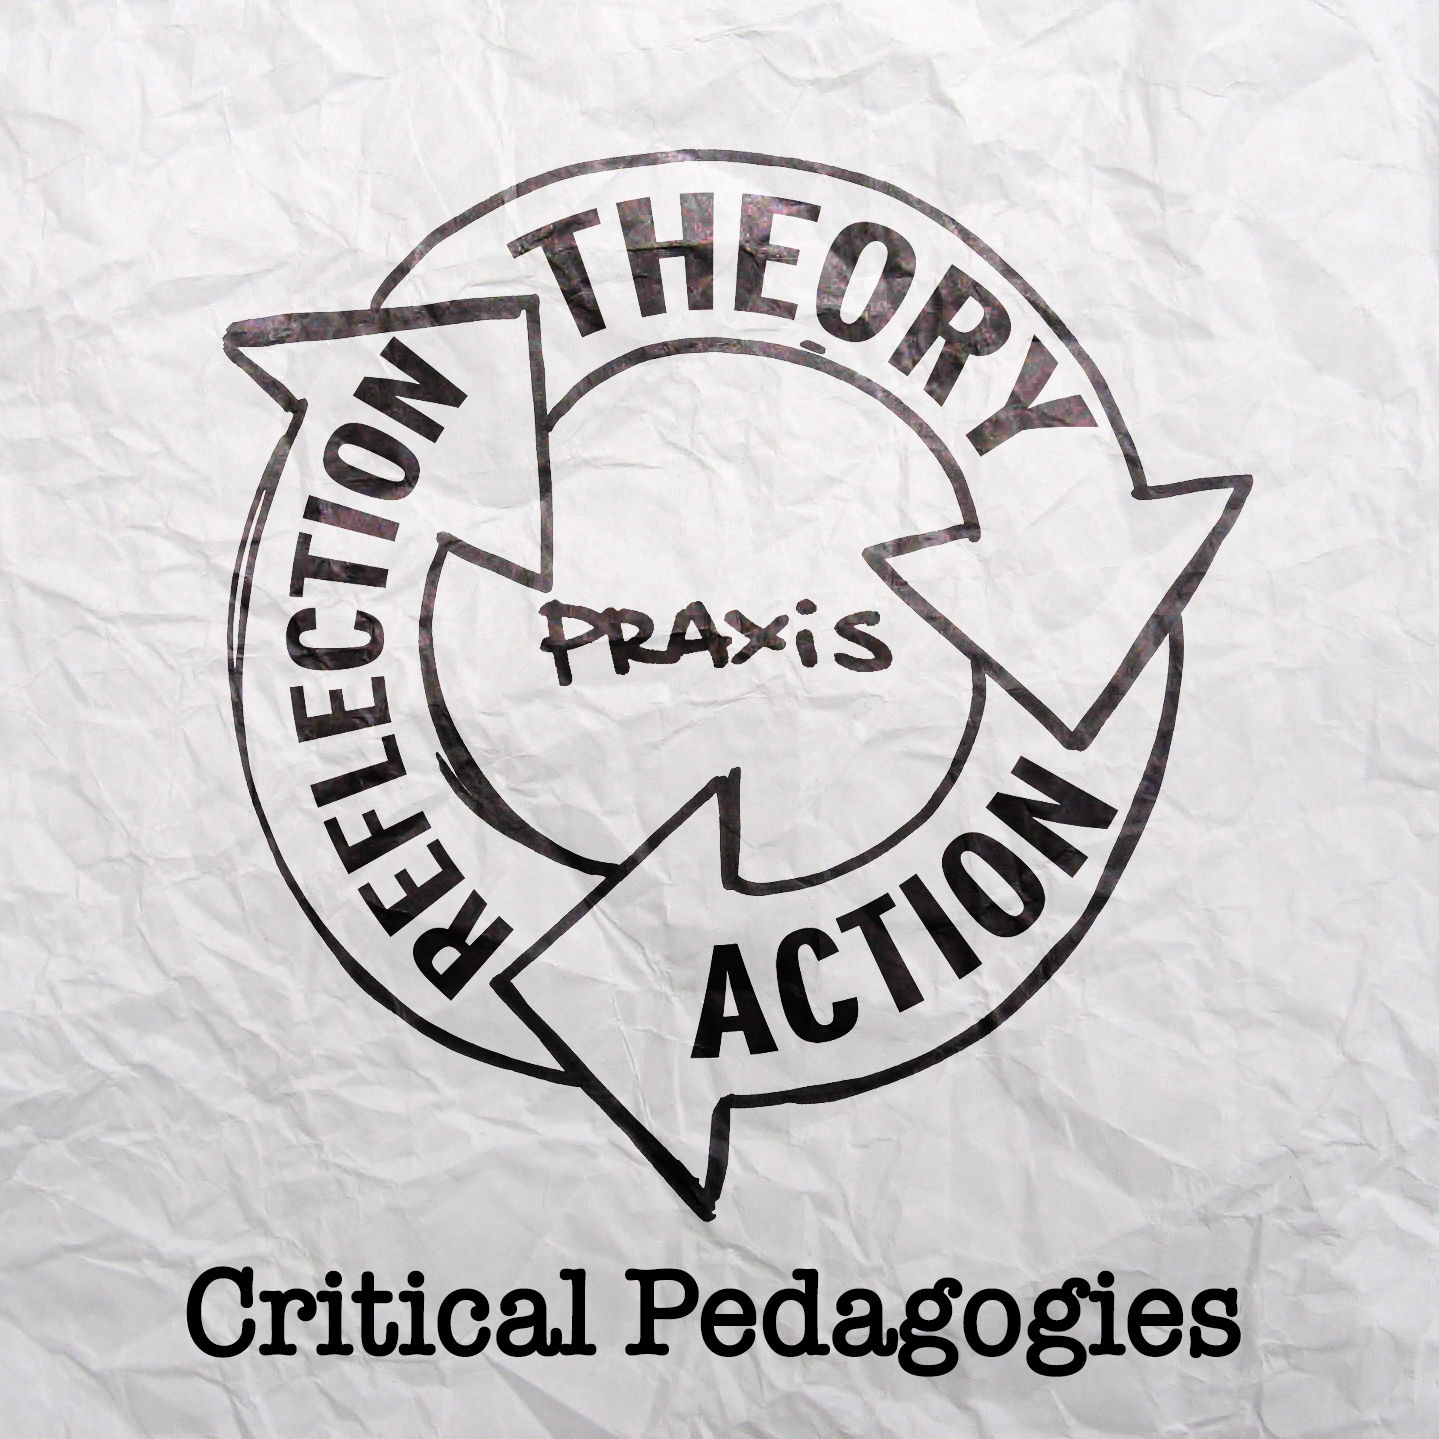 Critical Pedagogies-cropped.jpg